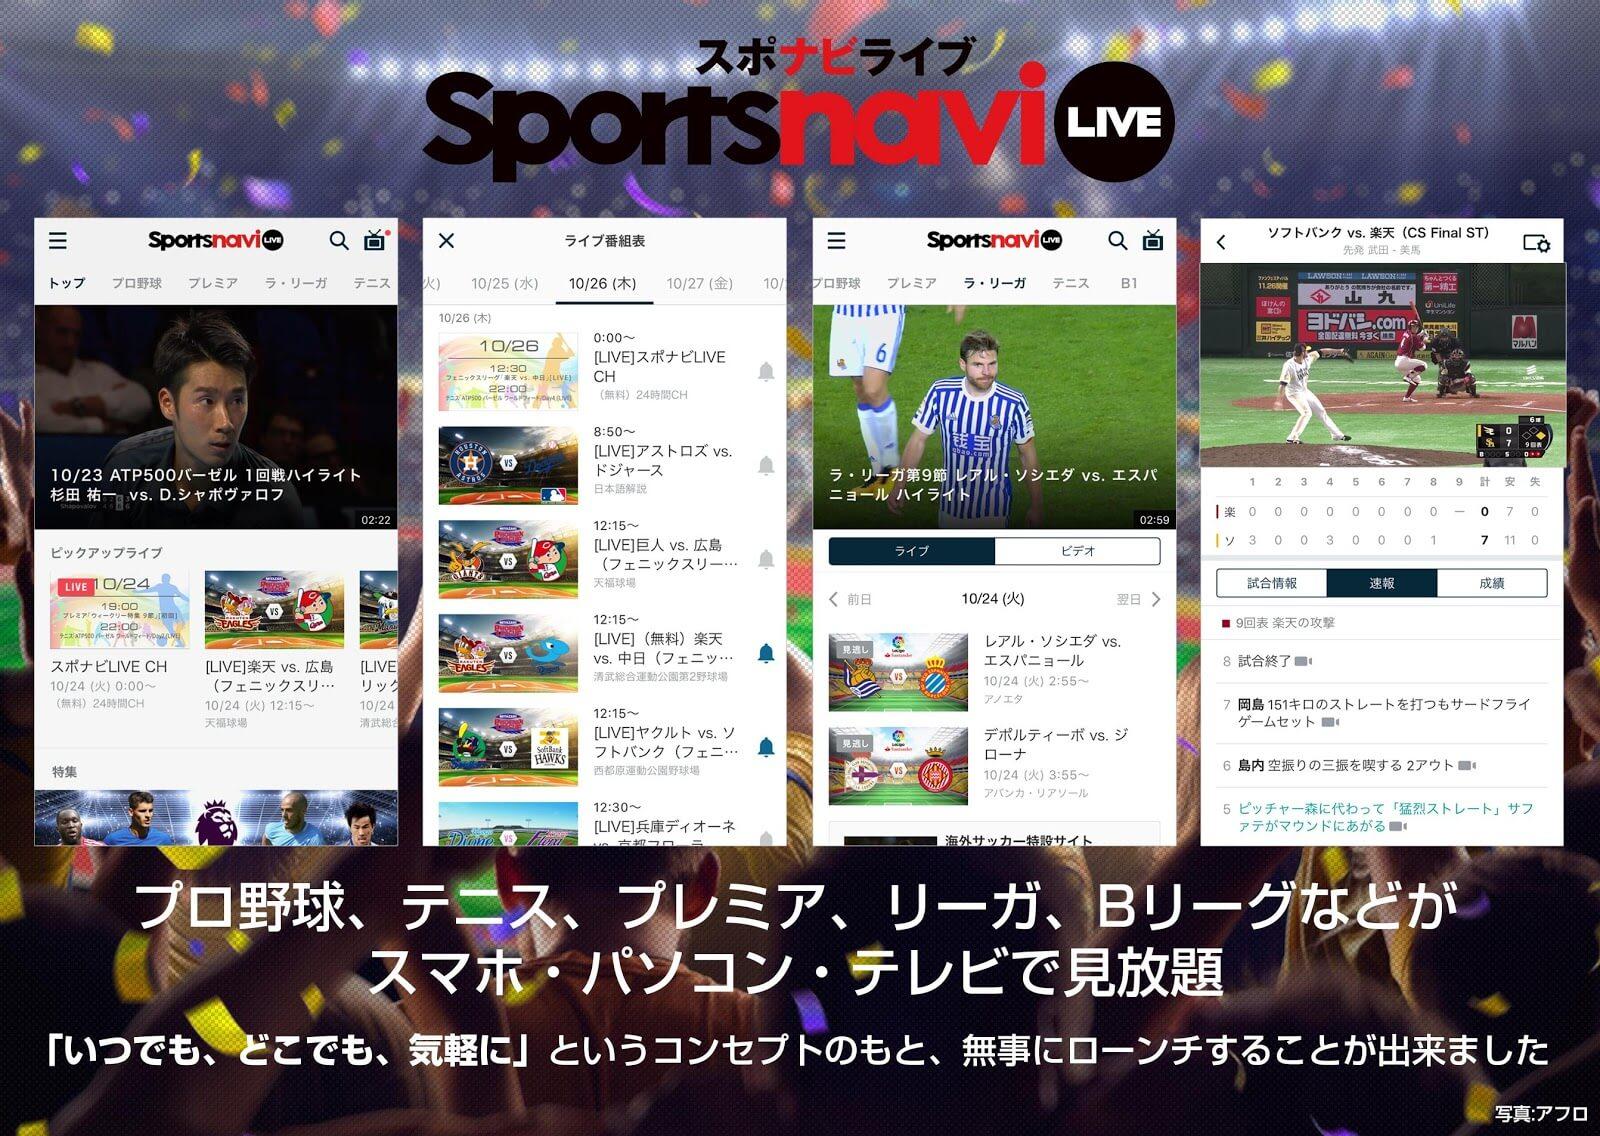 Sports_navi